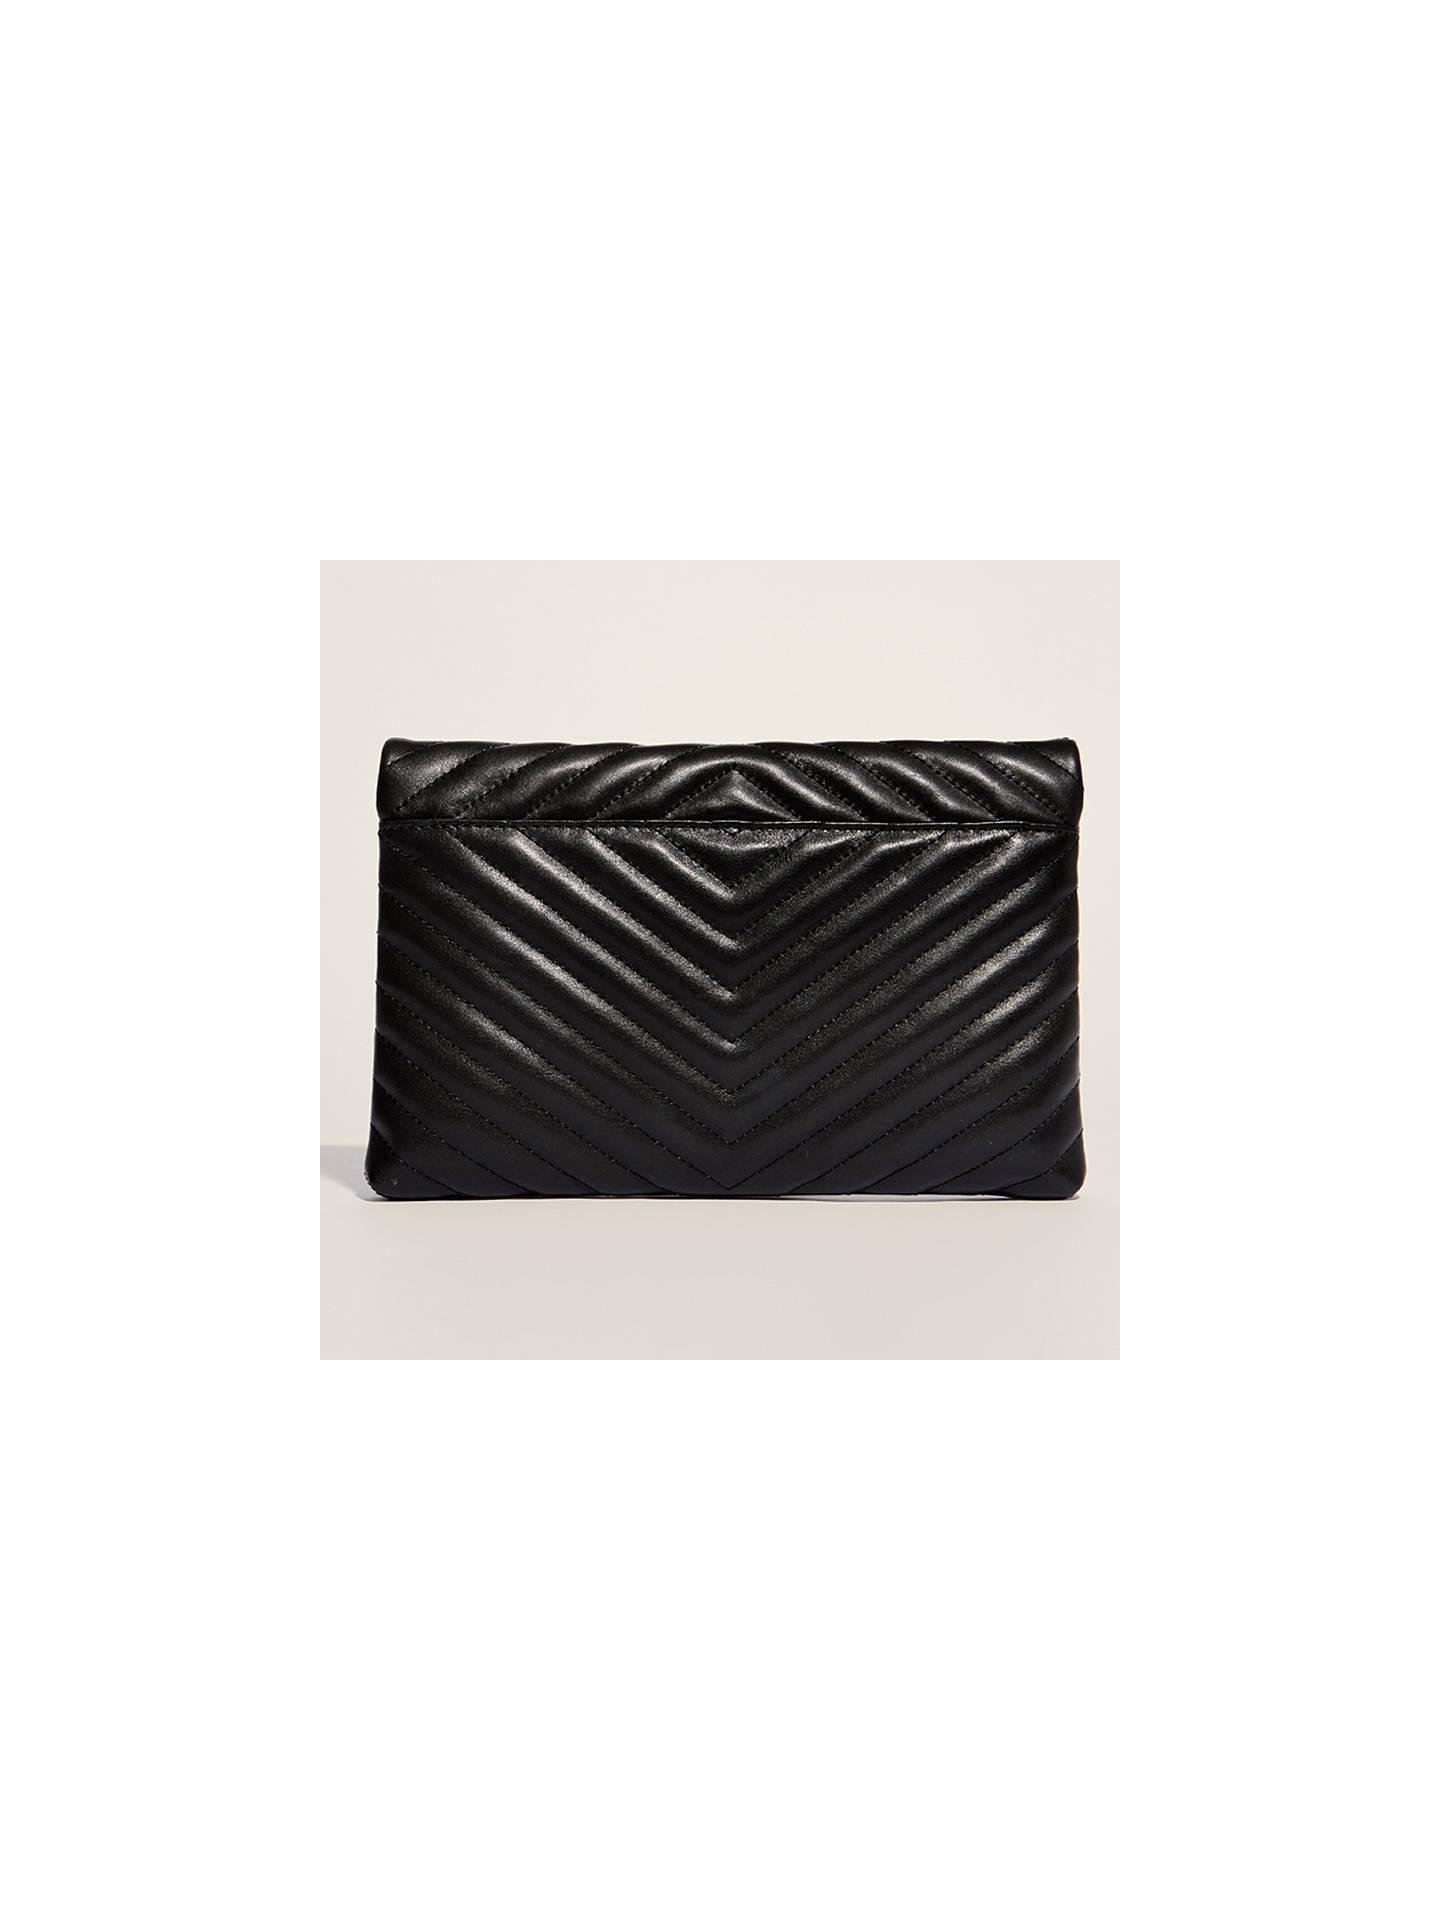 b07dc974df8 ... Buy Karen Millen Leather Quilted Brompton Bag, Black Online at  johnlewis.com ...